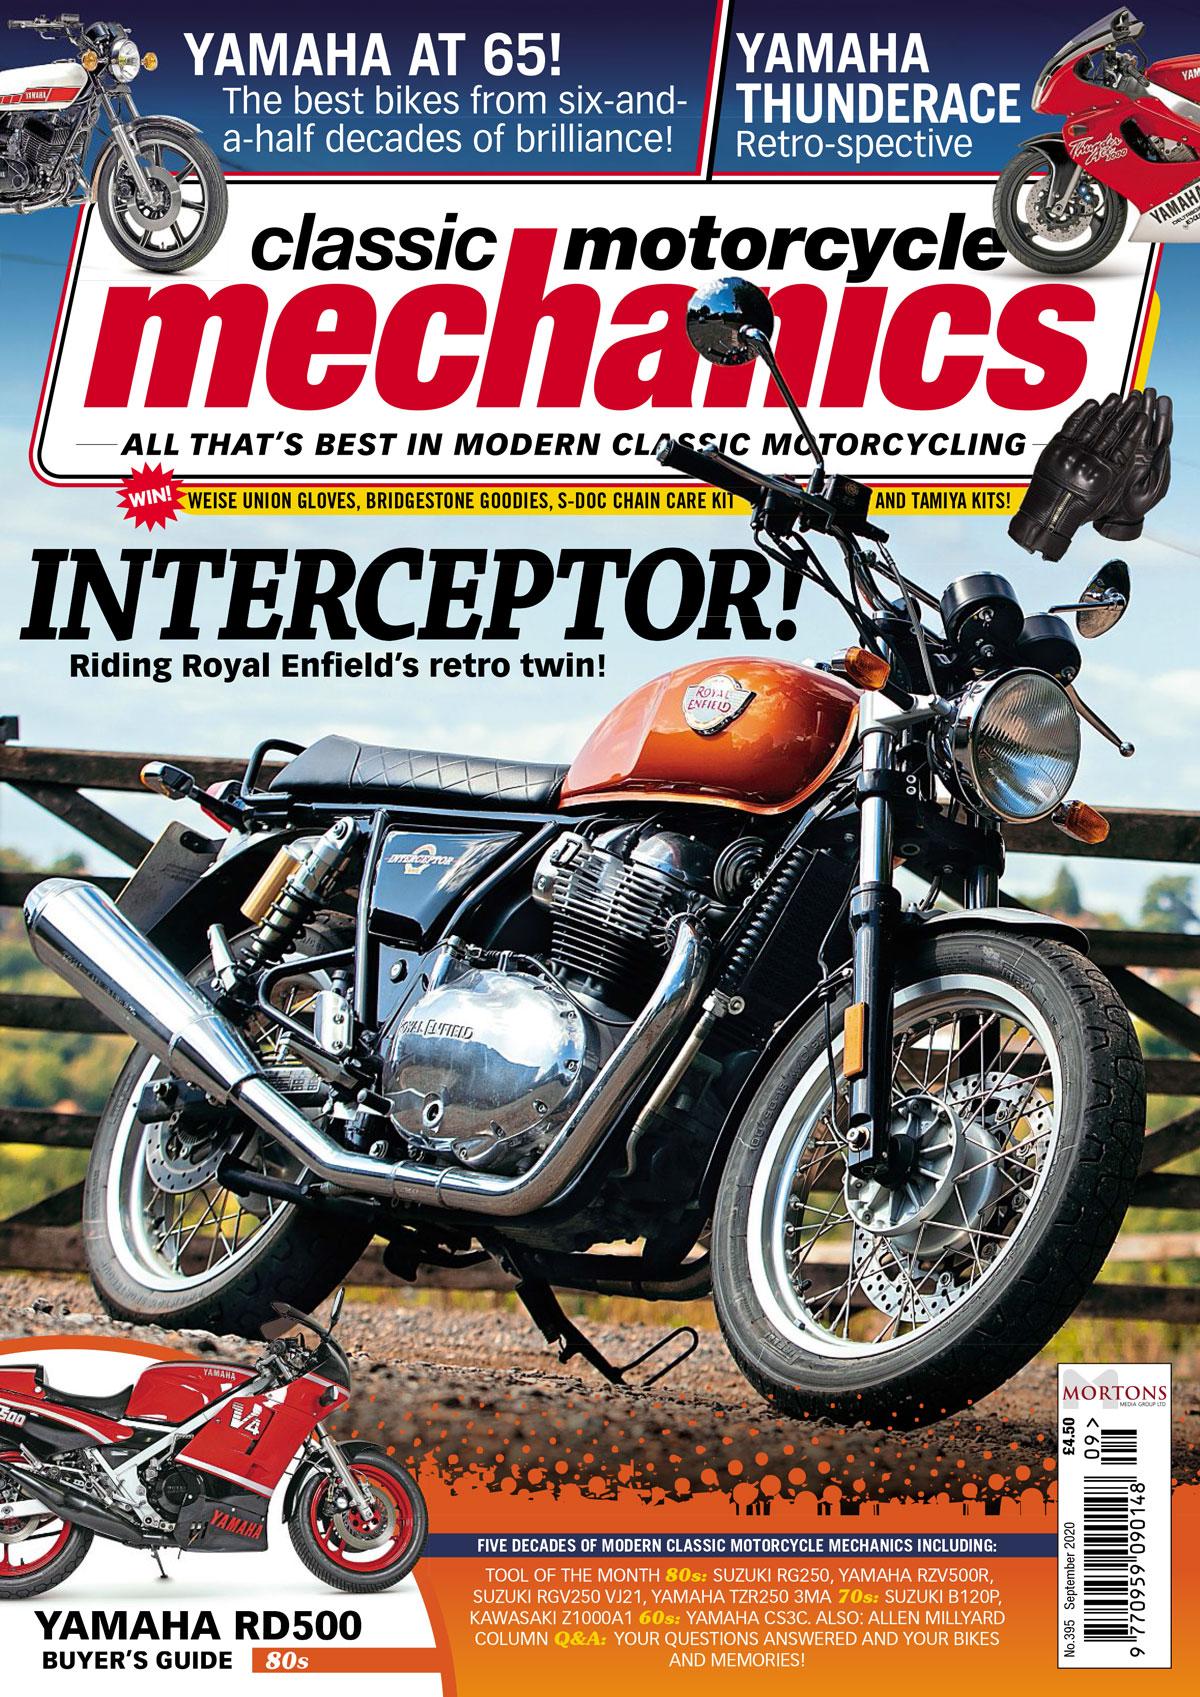 Classic Motorcycle Mechanics cover